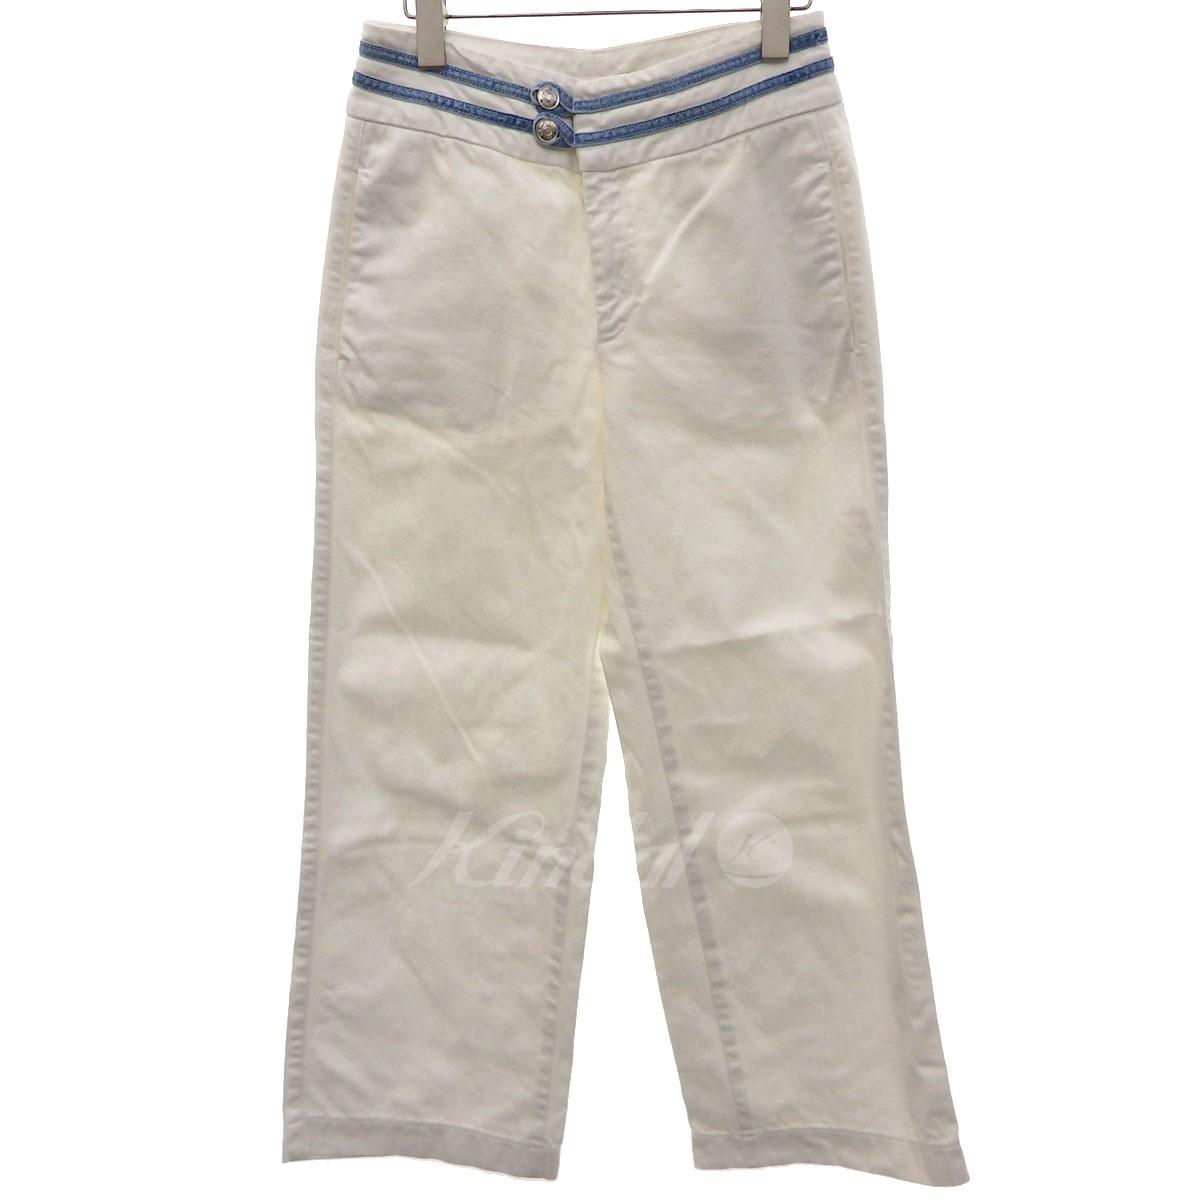 728280360e SEE BY CHLOE wide underwear white size: 40